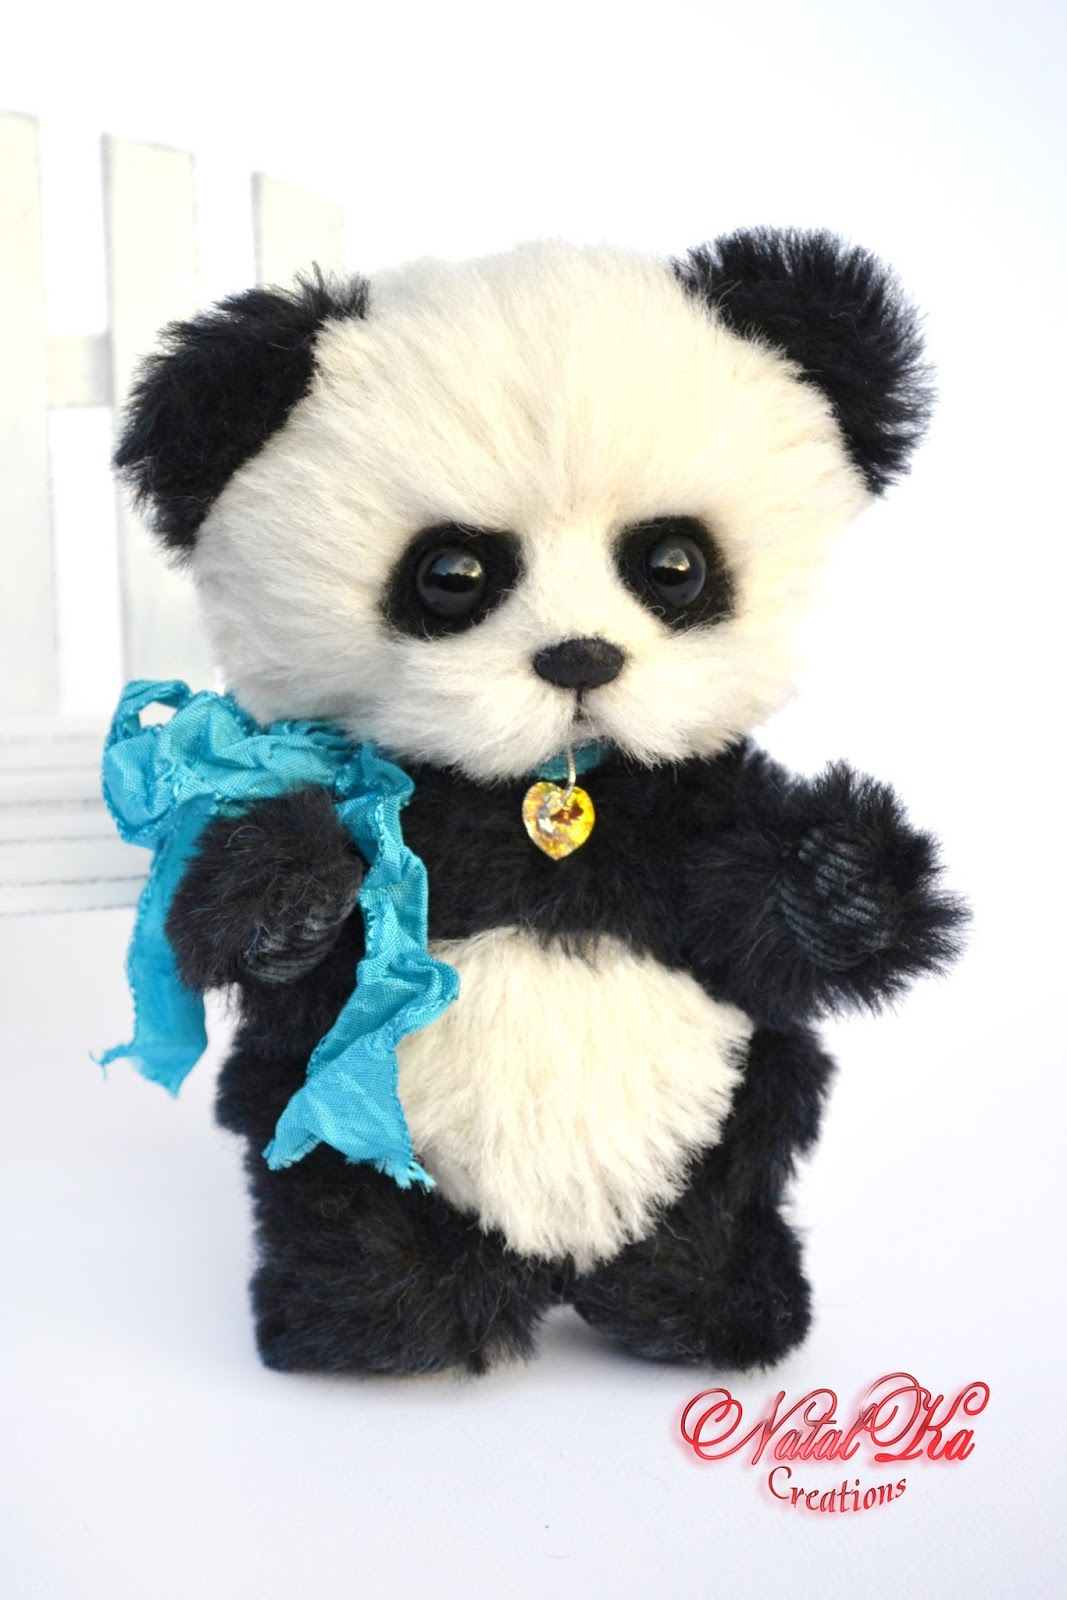 Artist teddy bear, artist bear, panda, handmade, ooak, alpaca, jointed, teddy, teddies by NatalKa Creations. Авторский мишка тедди, медведь тедди, панда, альпака, ручная работа от NatalKa Creations.